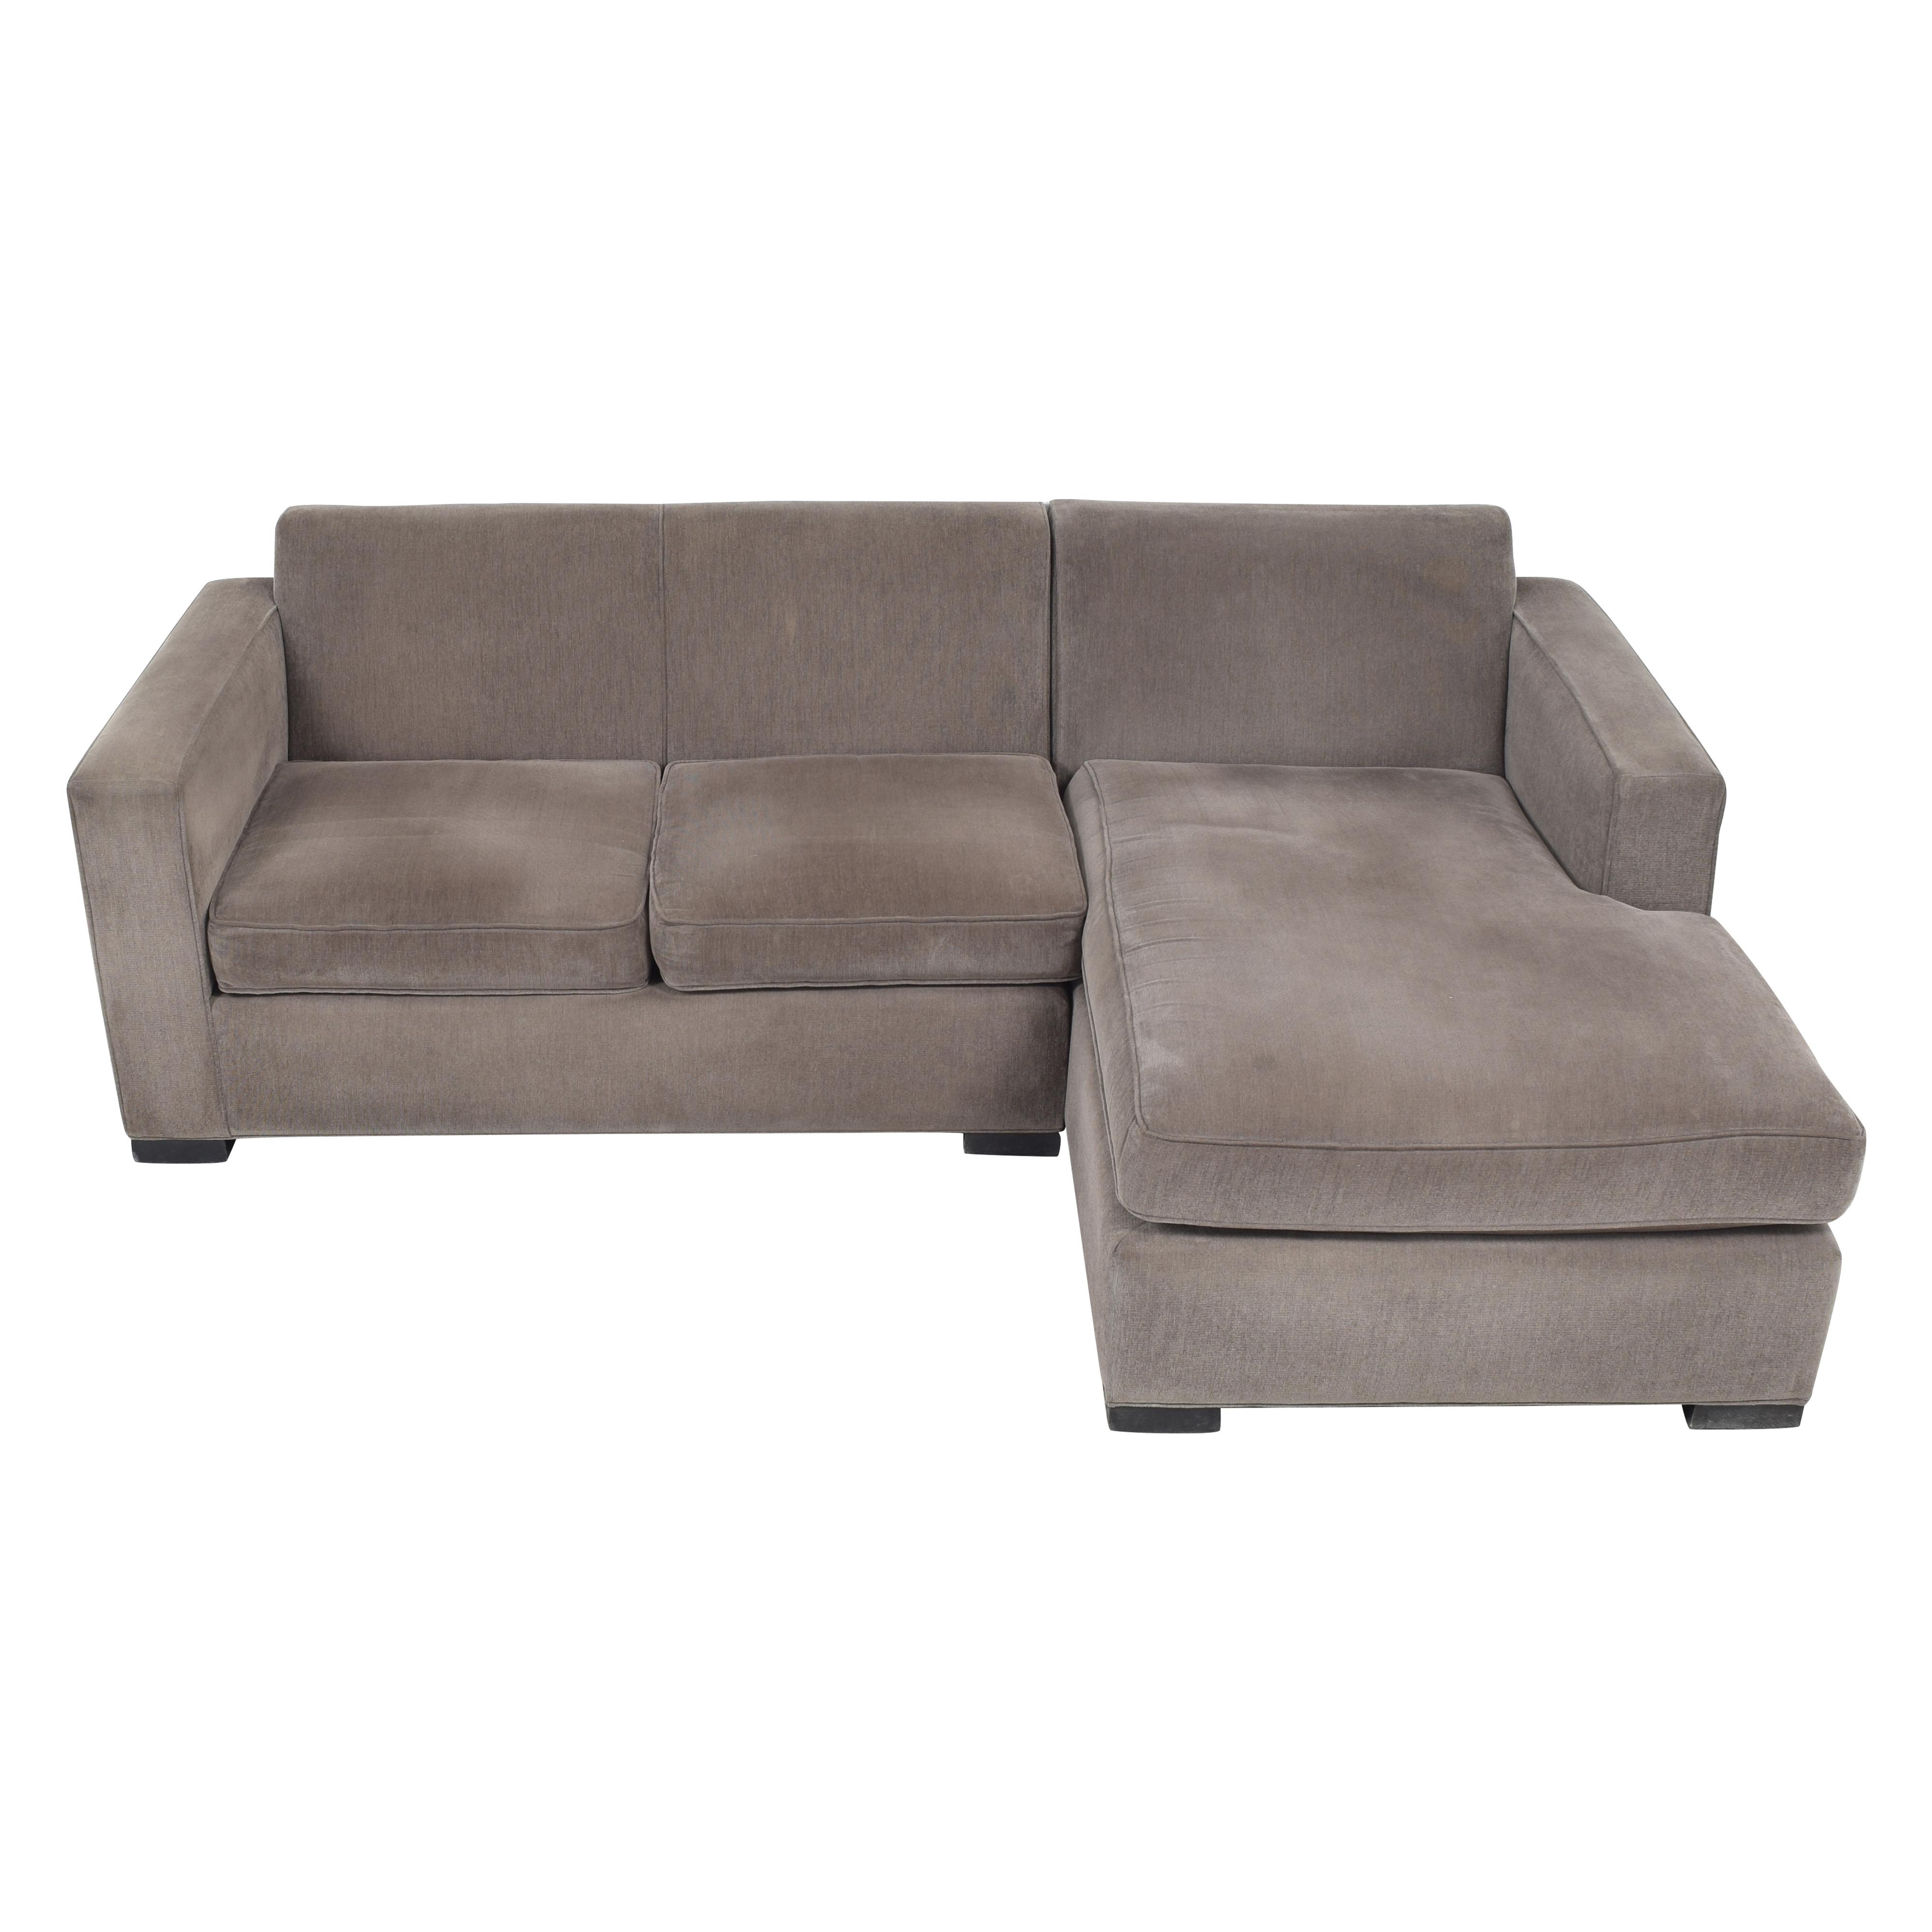 buy Room & Board Room & Board Morrison Sectional Sofa online